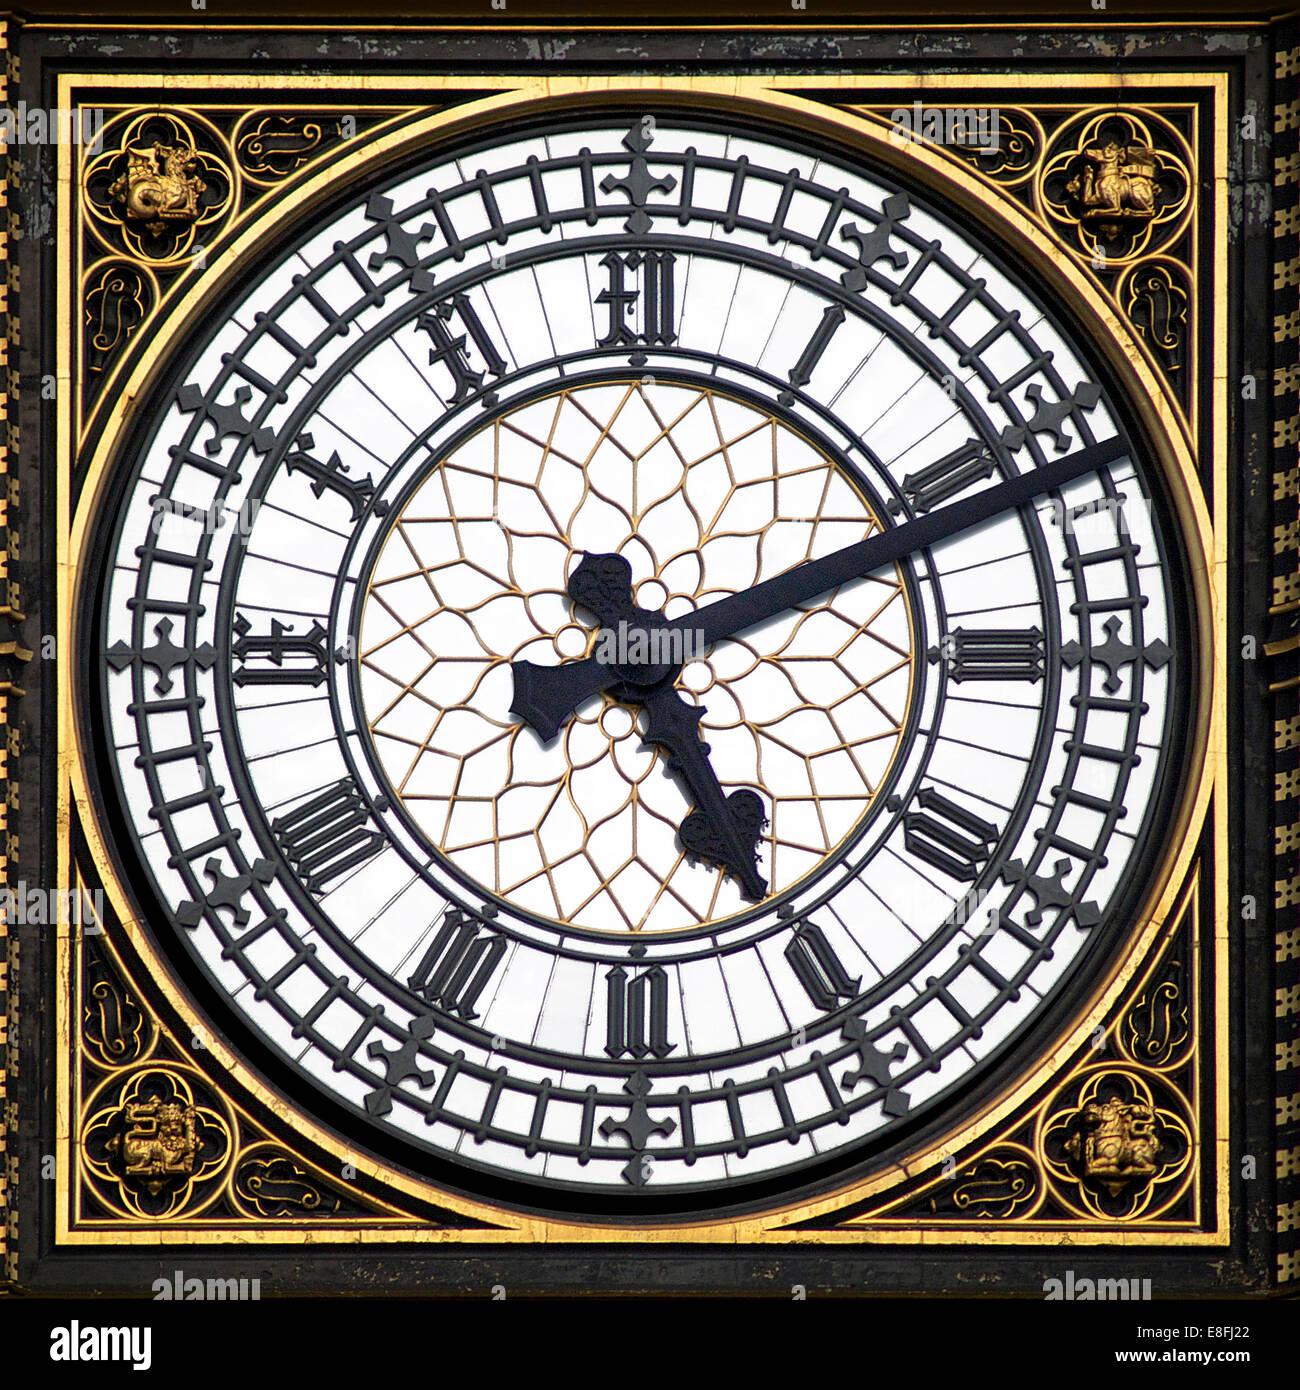 Big Ben Uhr Gesicht, London, England, UK Stockbild